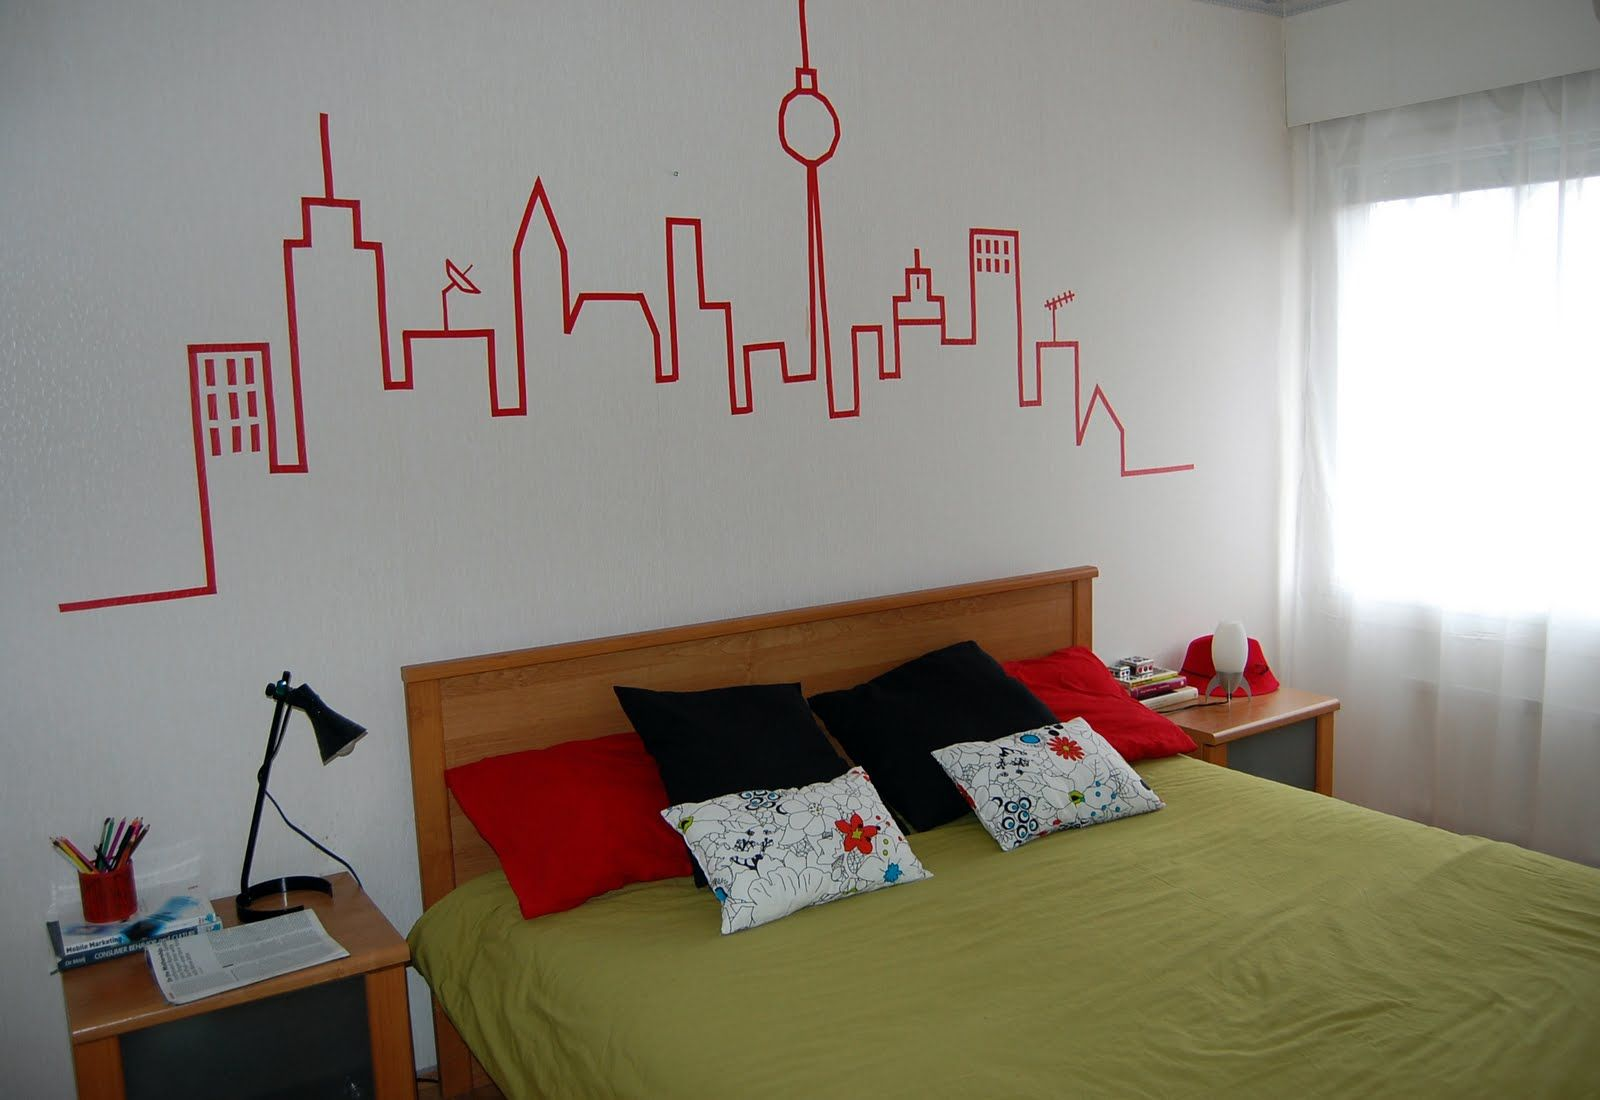 Tecnicas populares para decorar las paredes mi casa - Disenos para pintar paredes ...